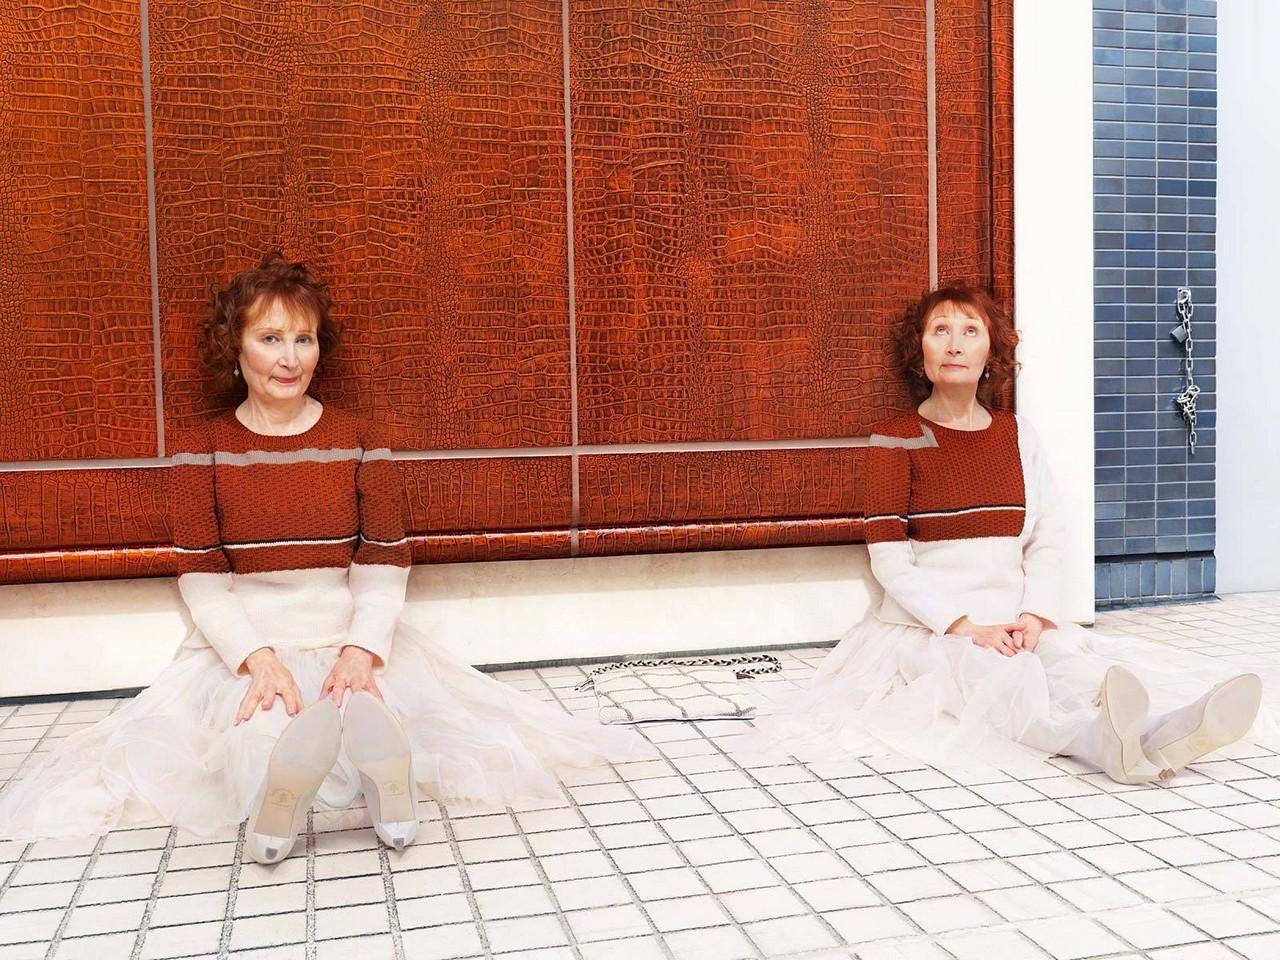 Парижские близнецы Мэди и Монетт Малру. Автор Джозеф Форд